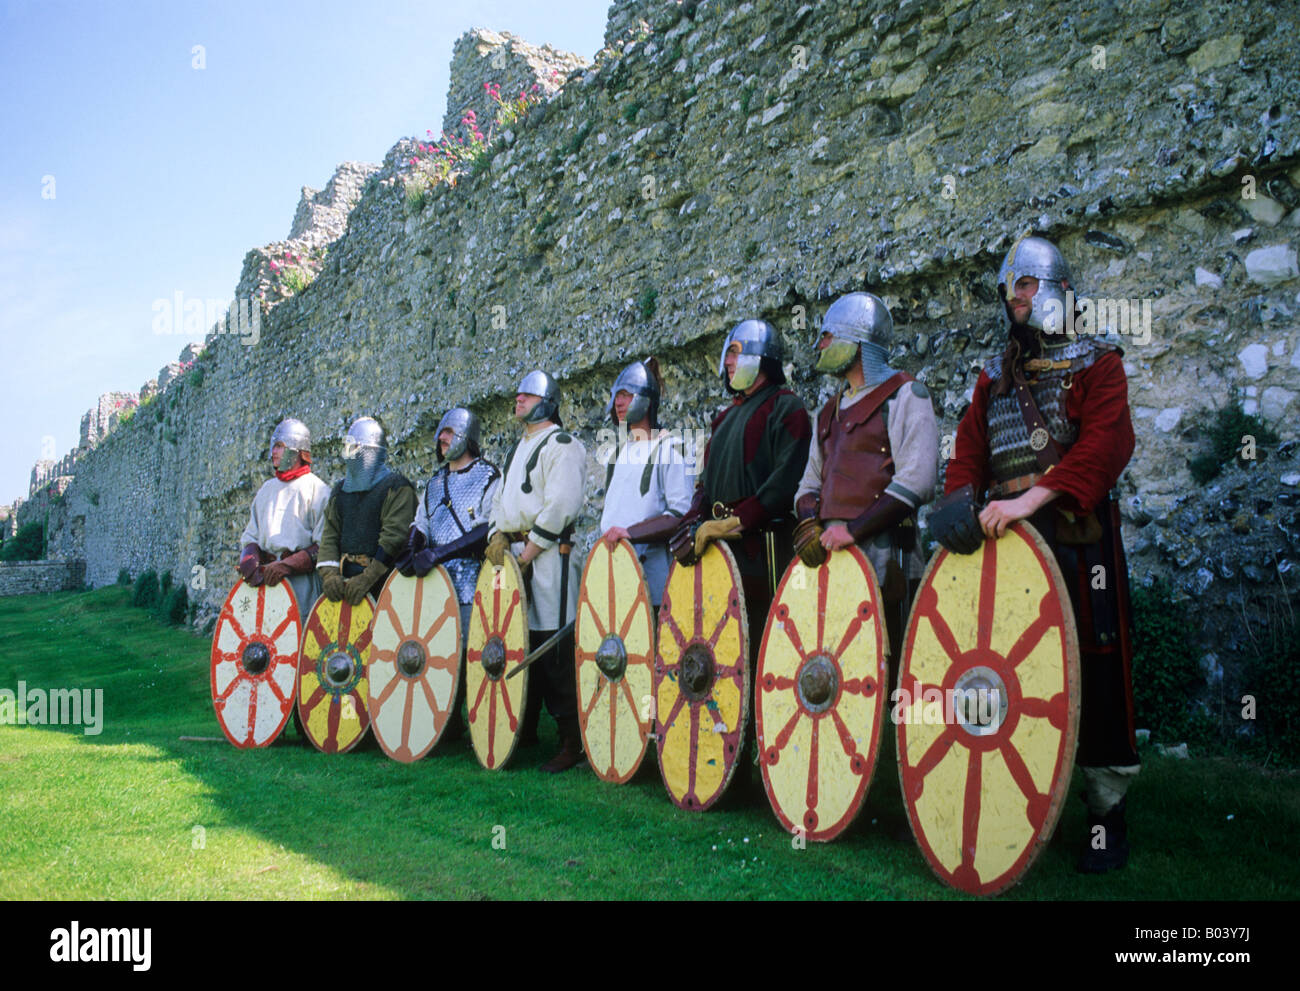 Romano British Saxon Warriors shields armour 5th century English history re-enactment helmets soldiers military - Stock Image